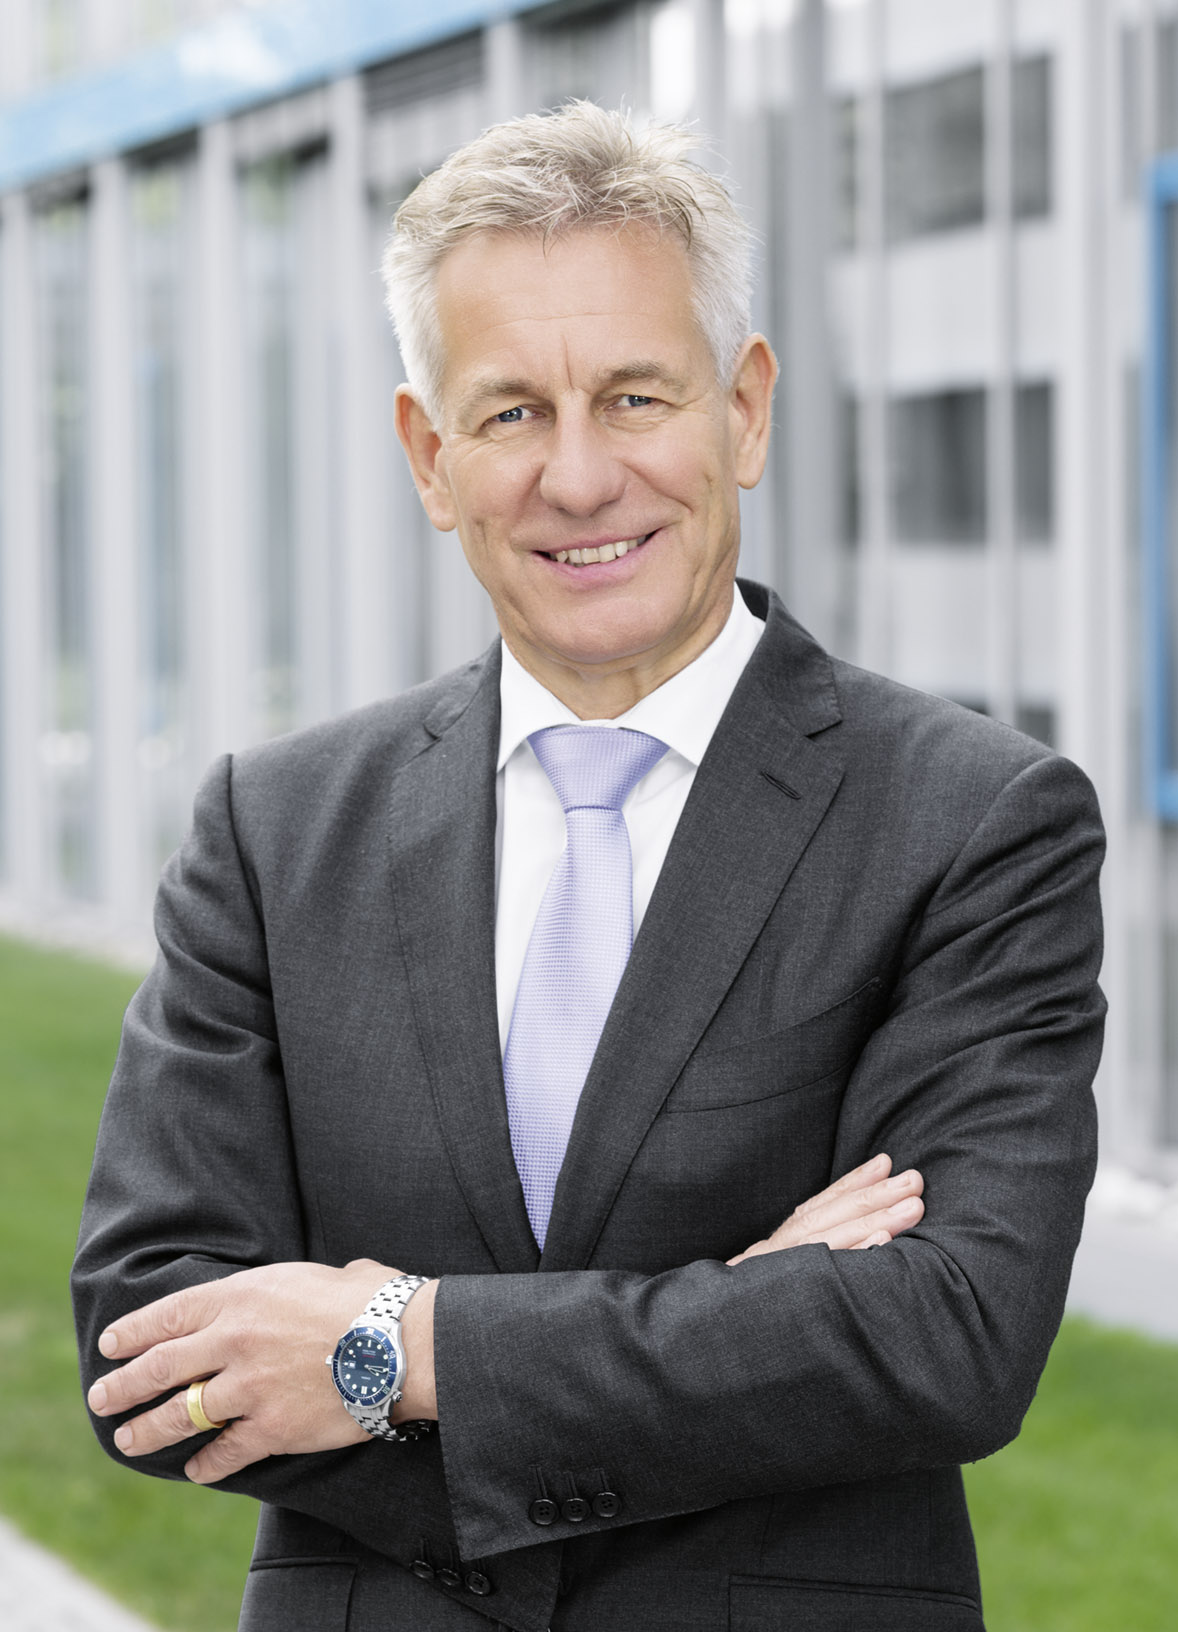 Dr. Eberhard Veit